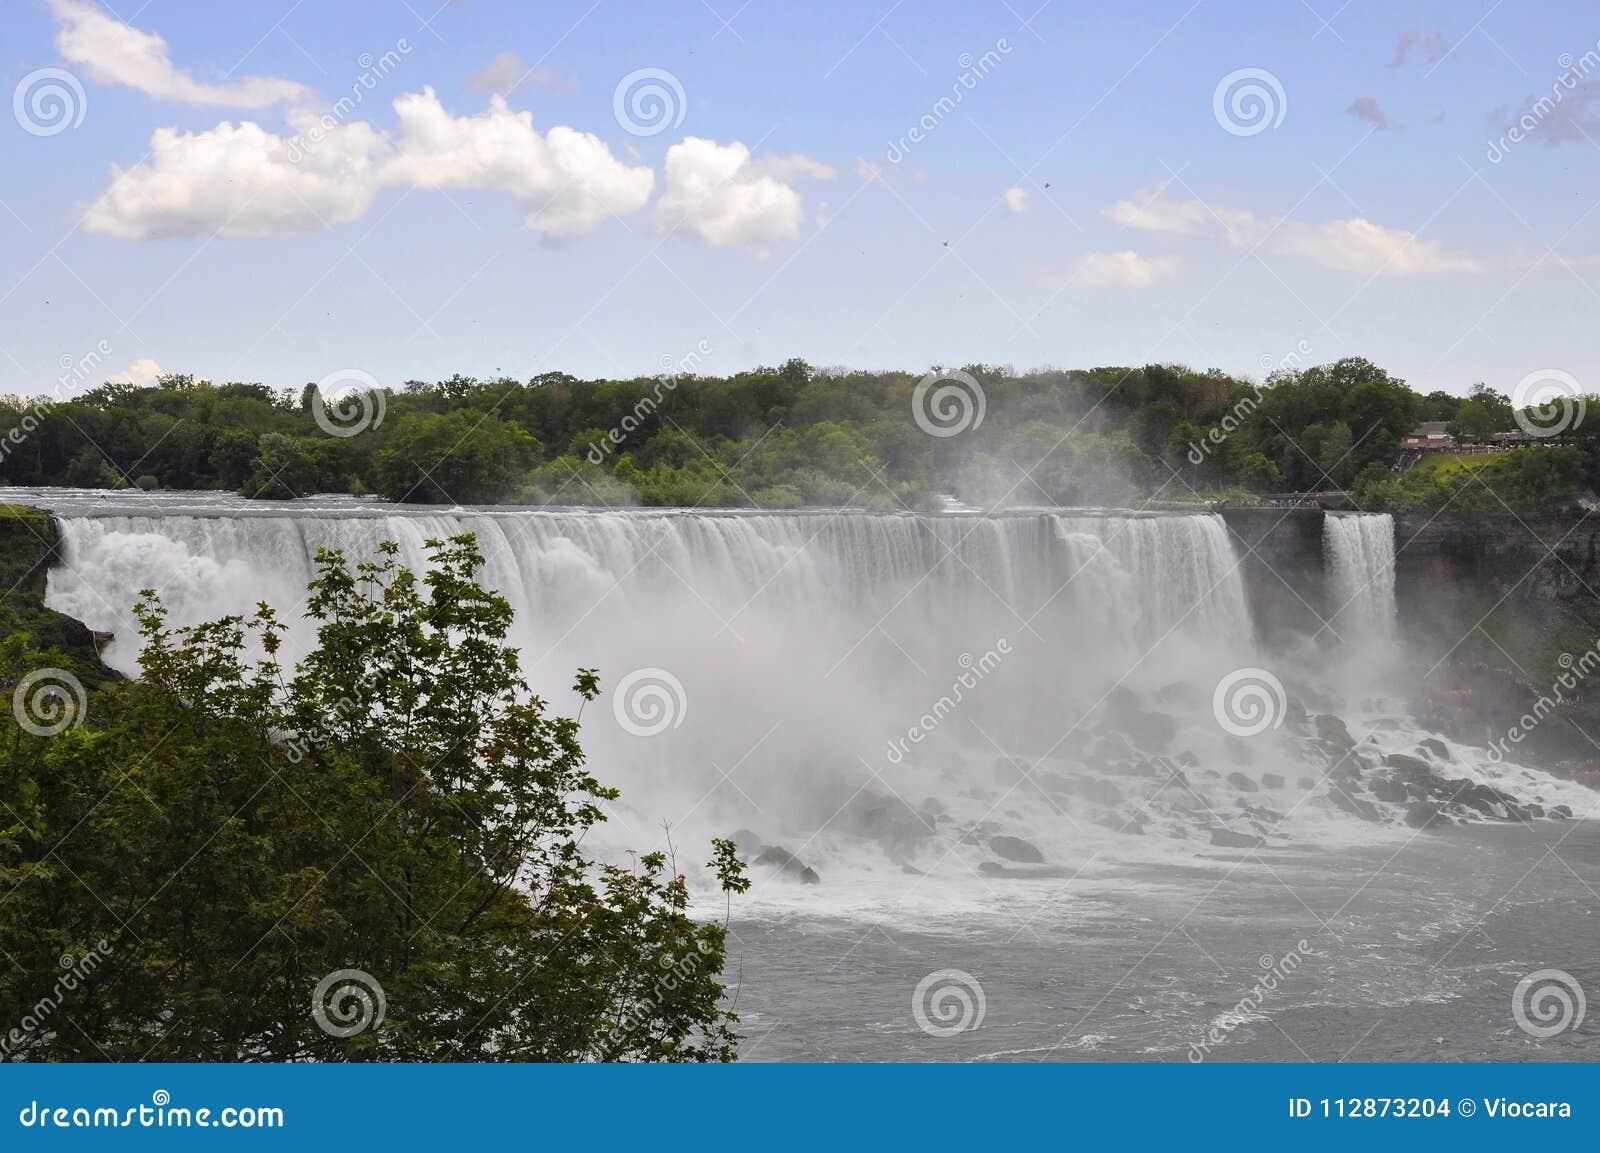 Niagara Falls 24th June United States Side From Niagara